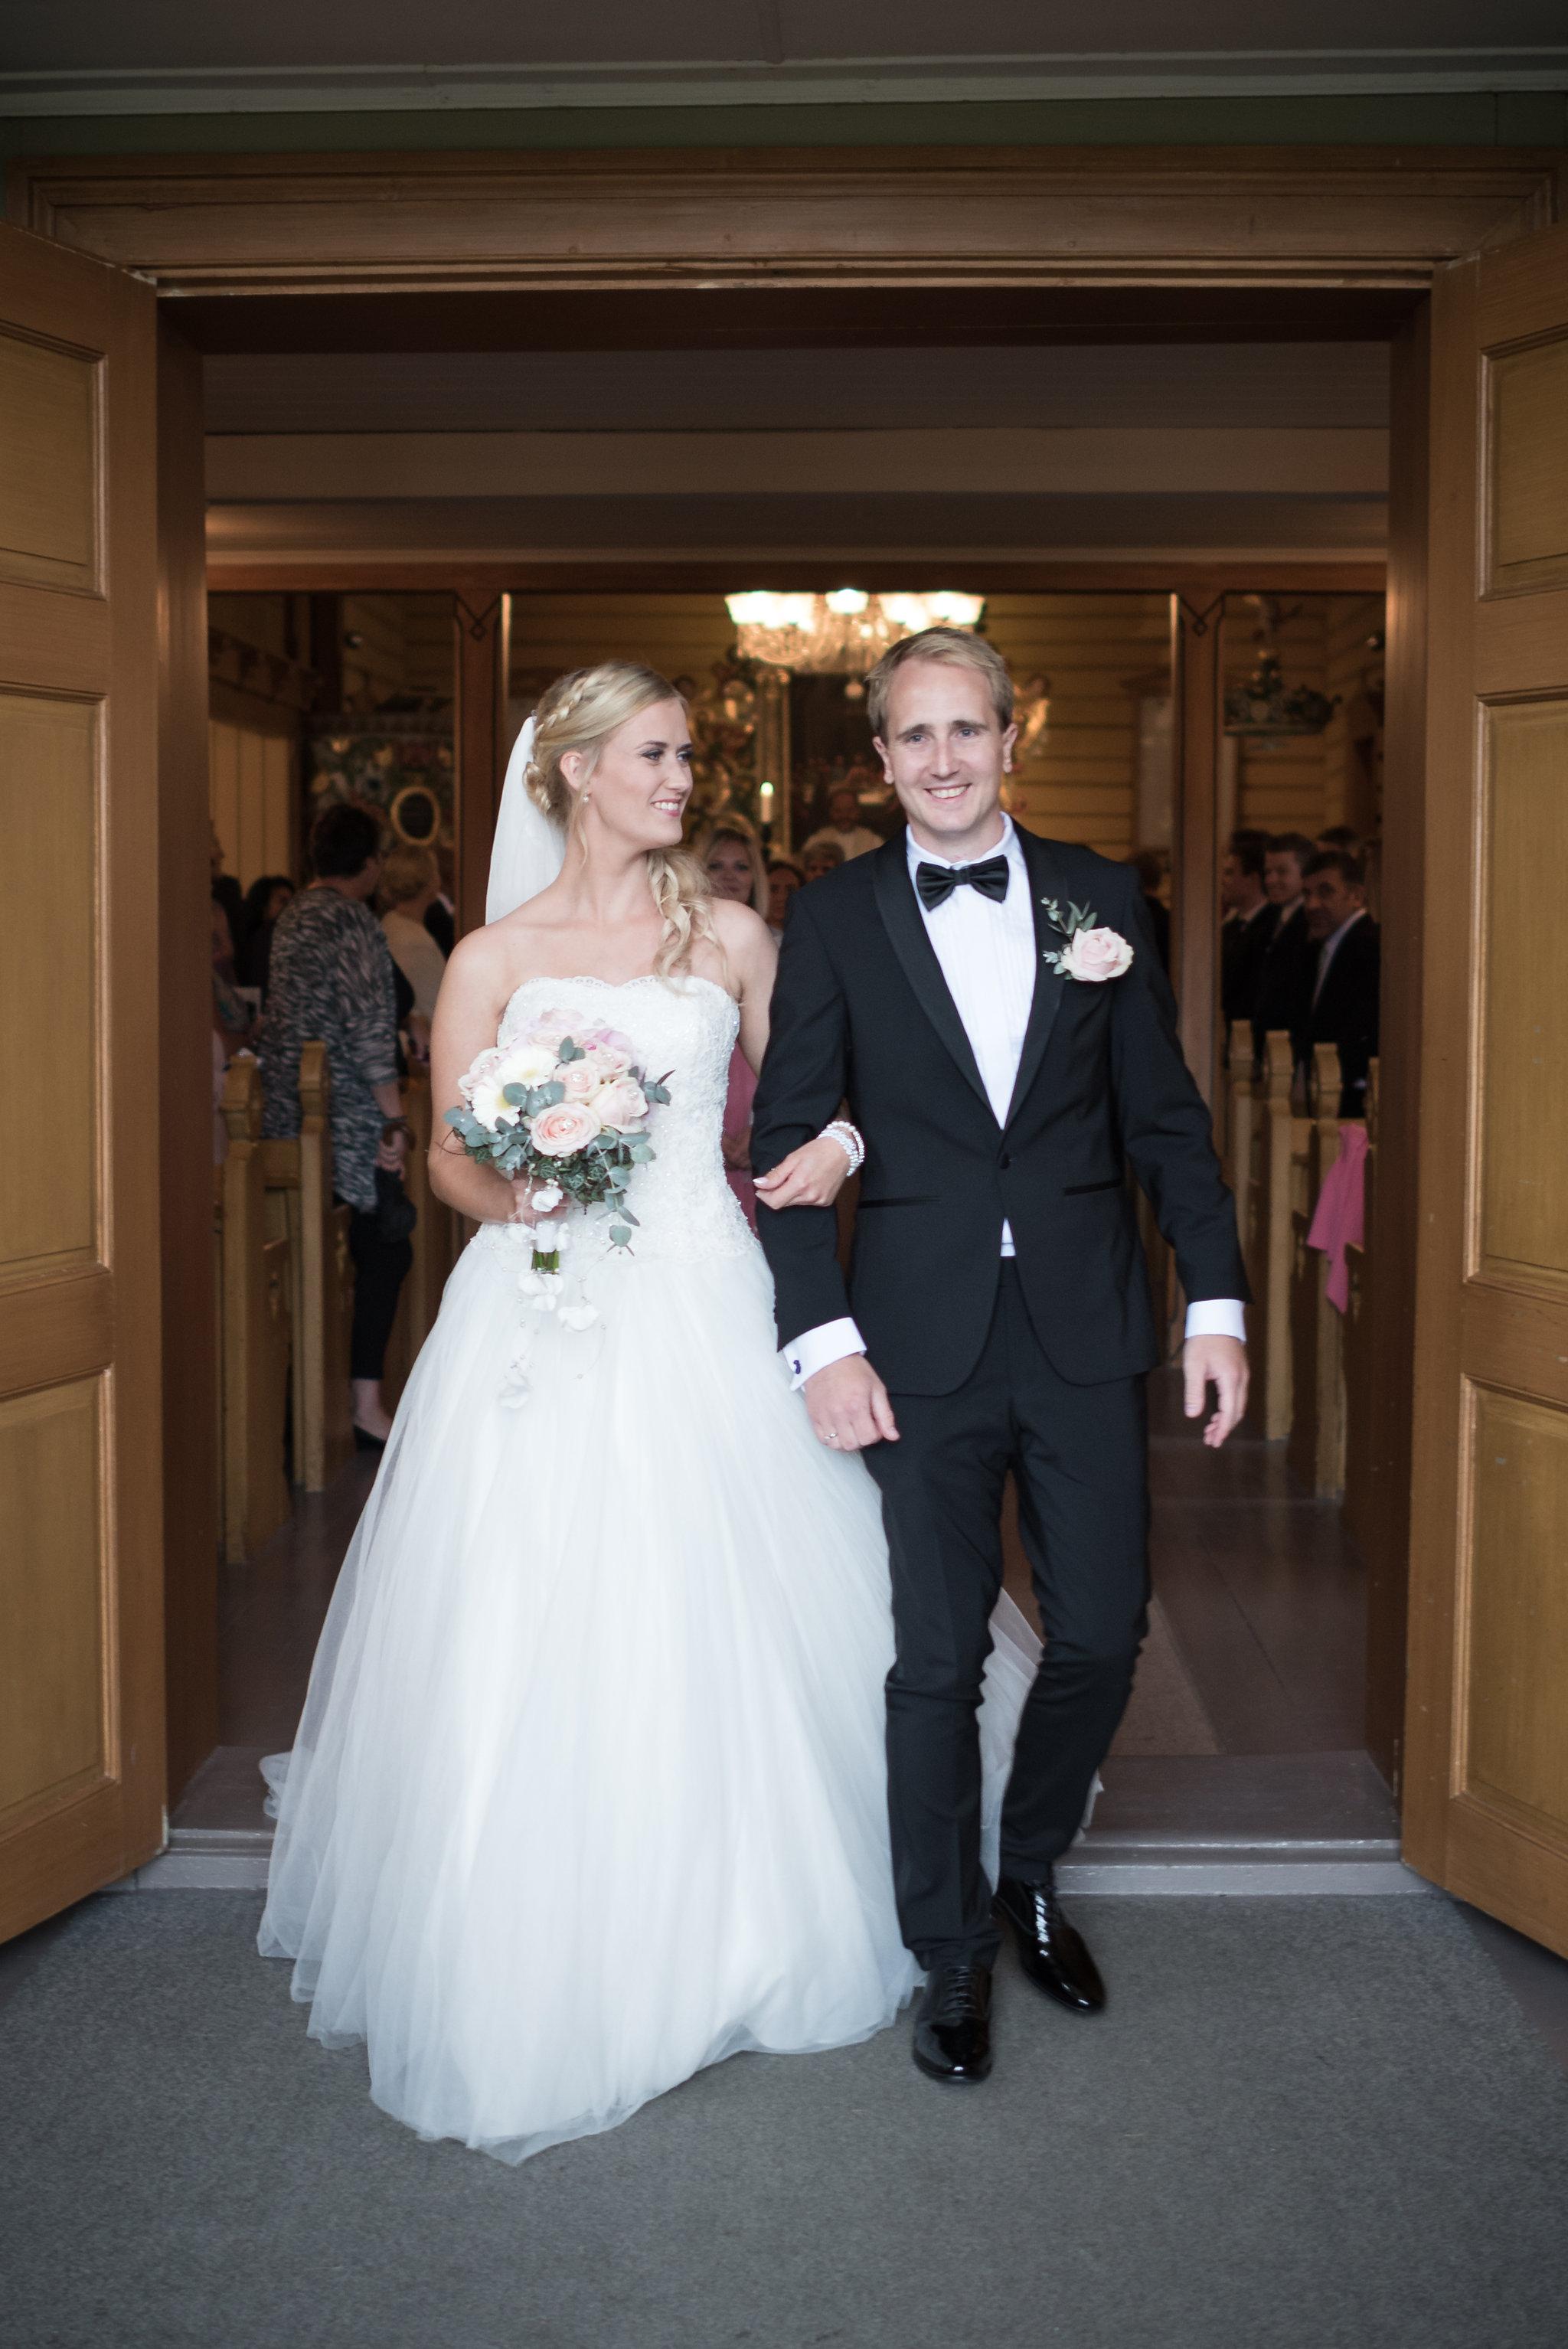 750_1230fotograf-bryllup-tyrifjorden.jpg